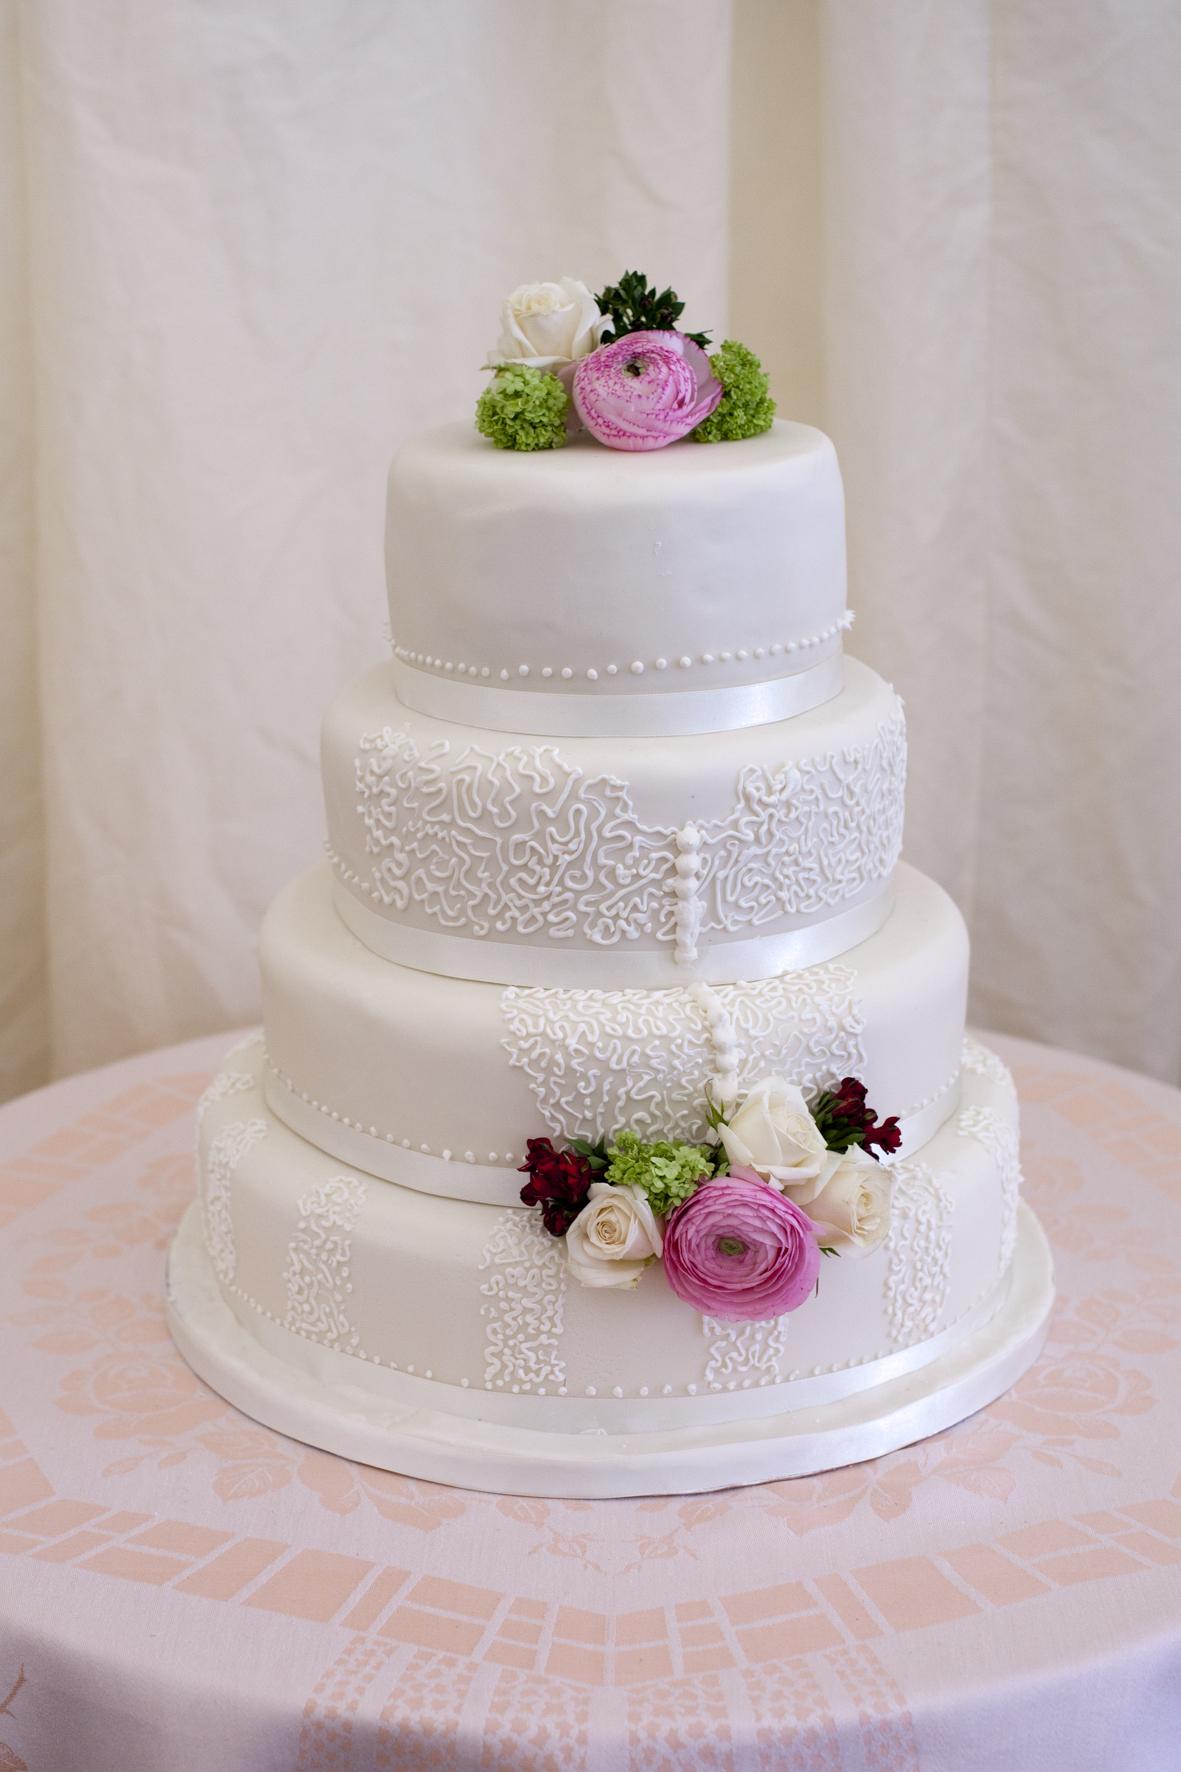 Wedding example_M&P__MG_4040_Claudia Leisinger.jpg